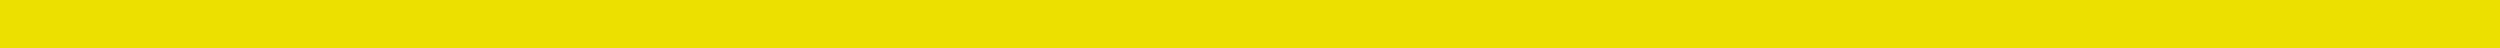 Oxy_yellowline.jpg